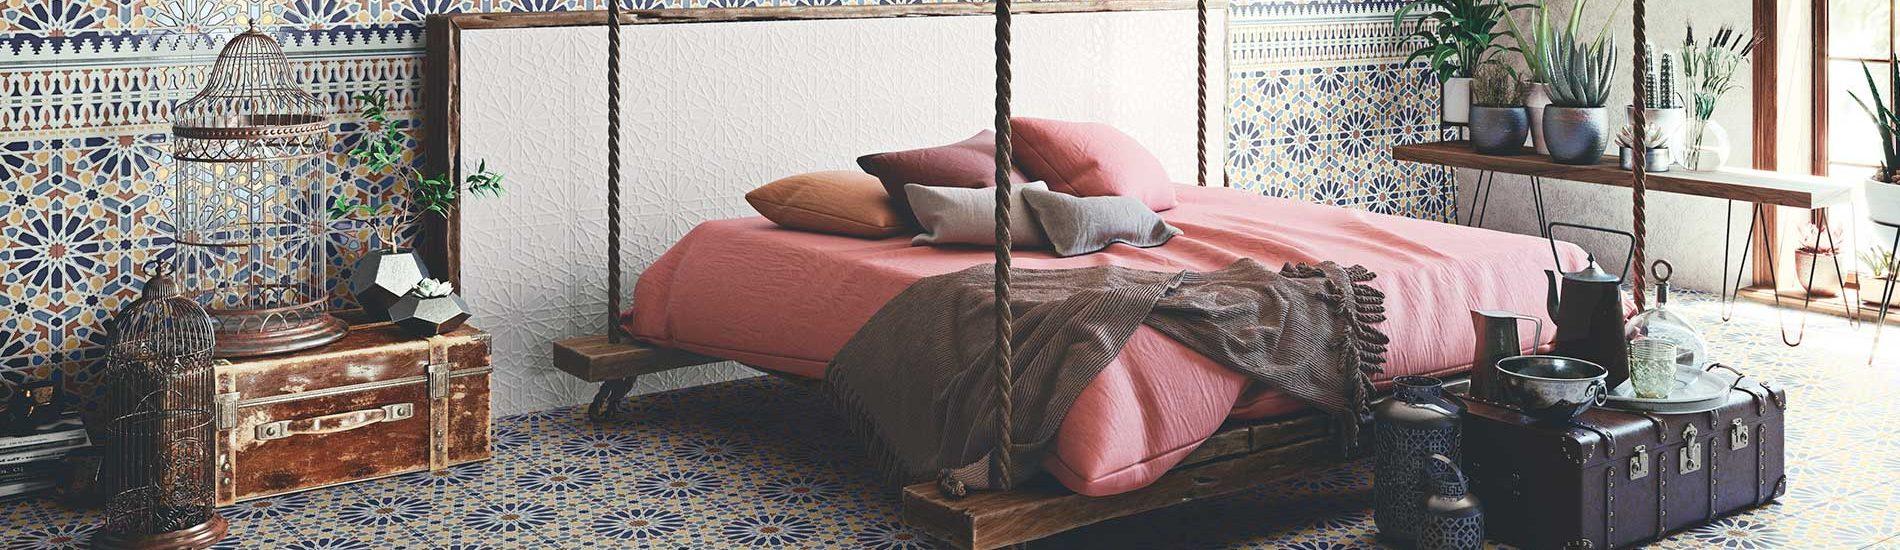 banner-alhambra-spanish-cement-look-deco-floor-wall-tile-aparici-apavisa-anaheim